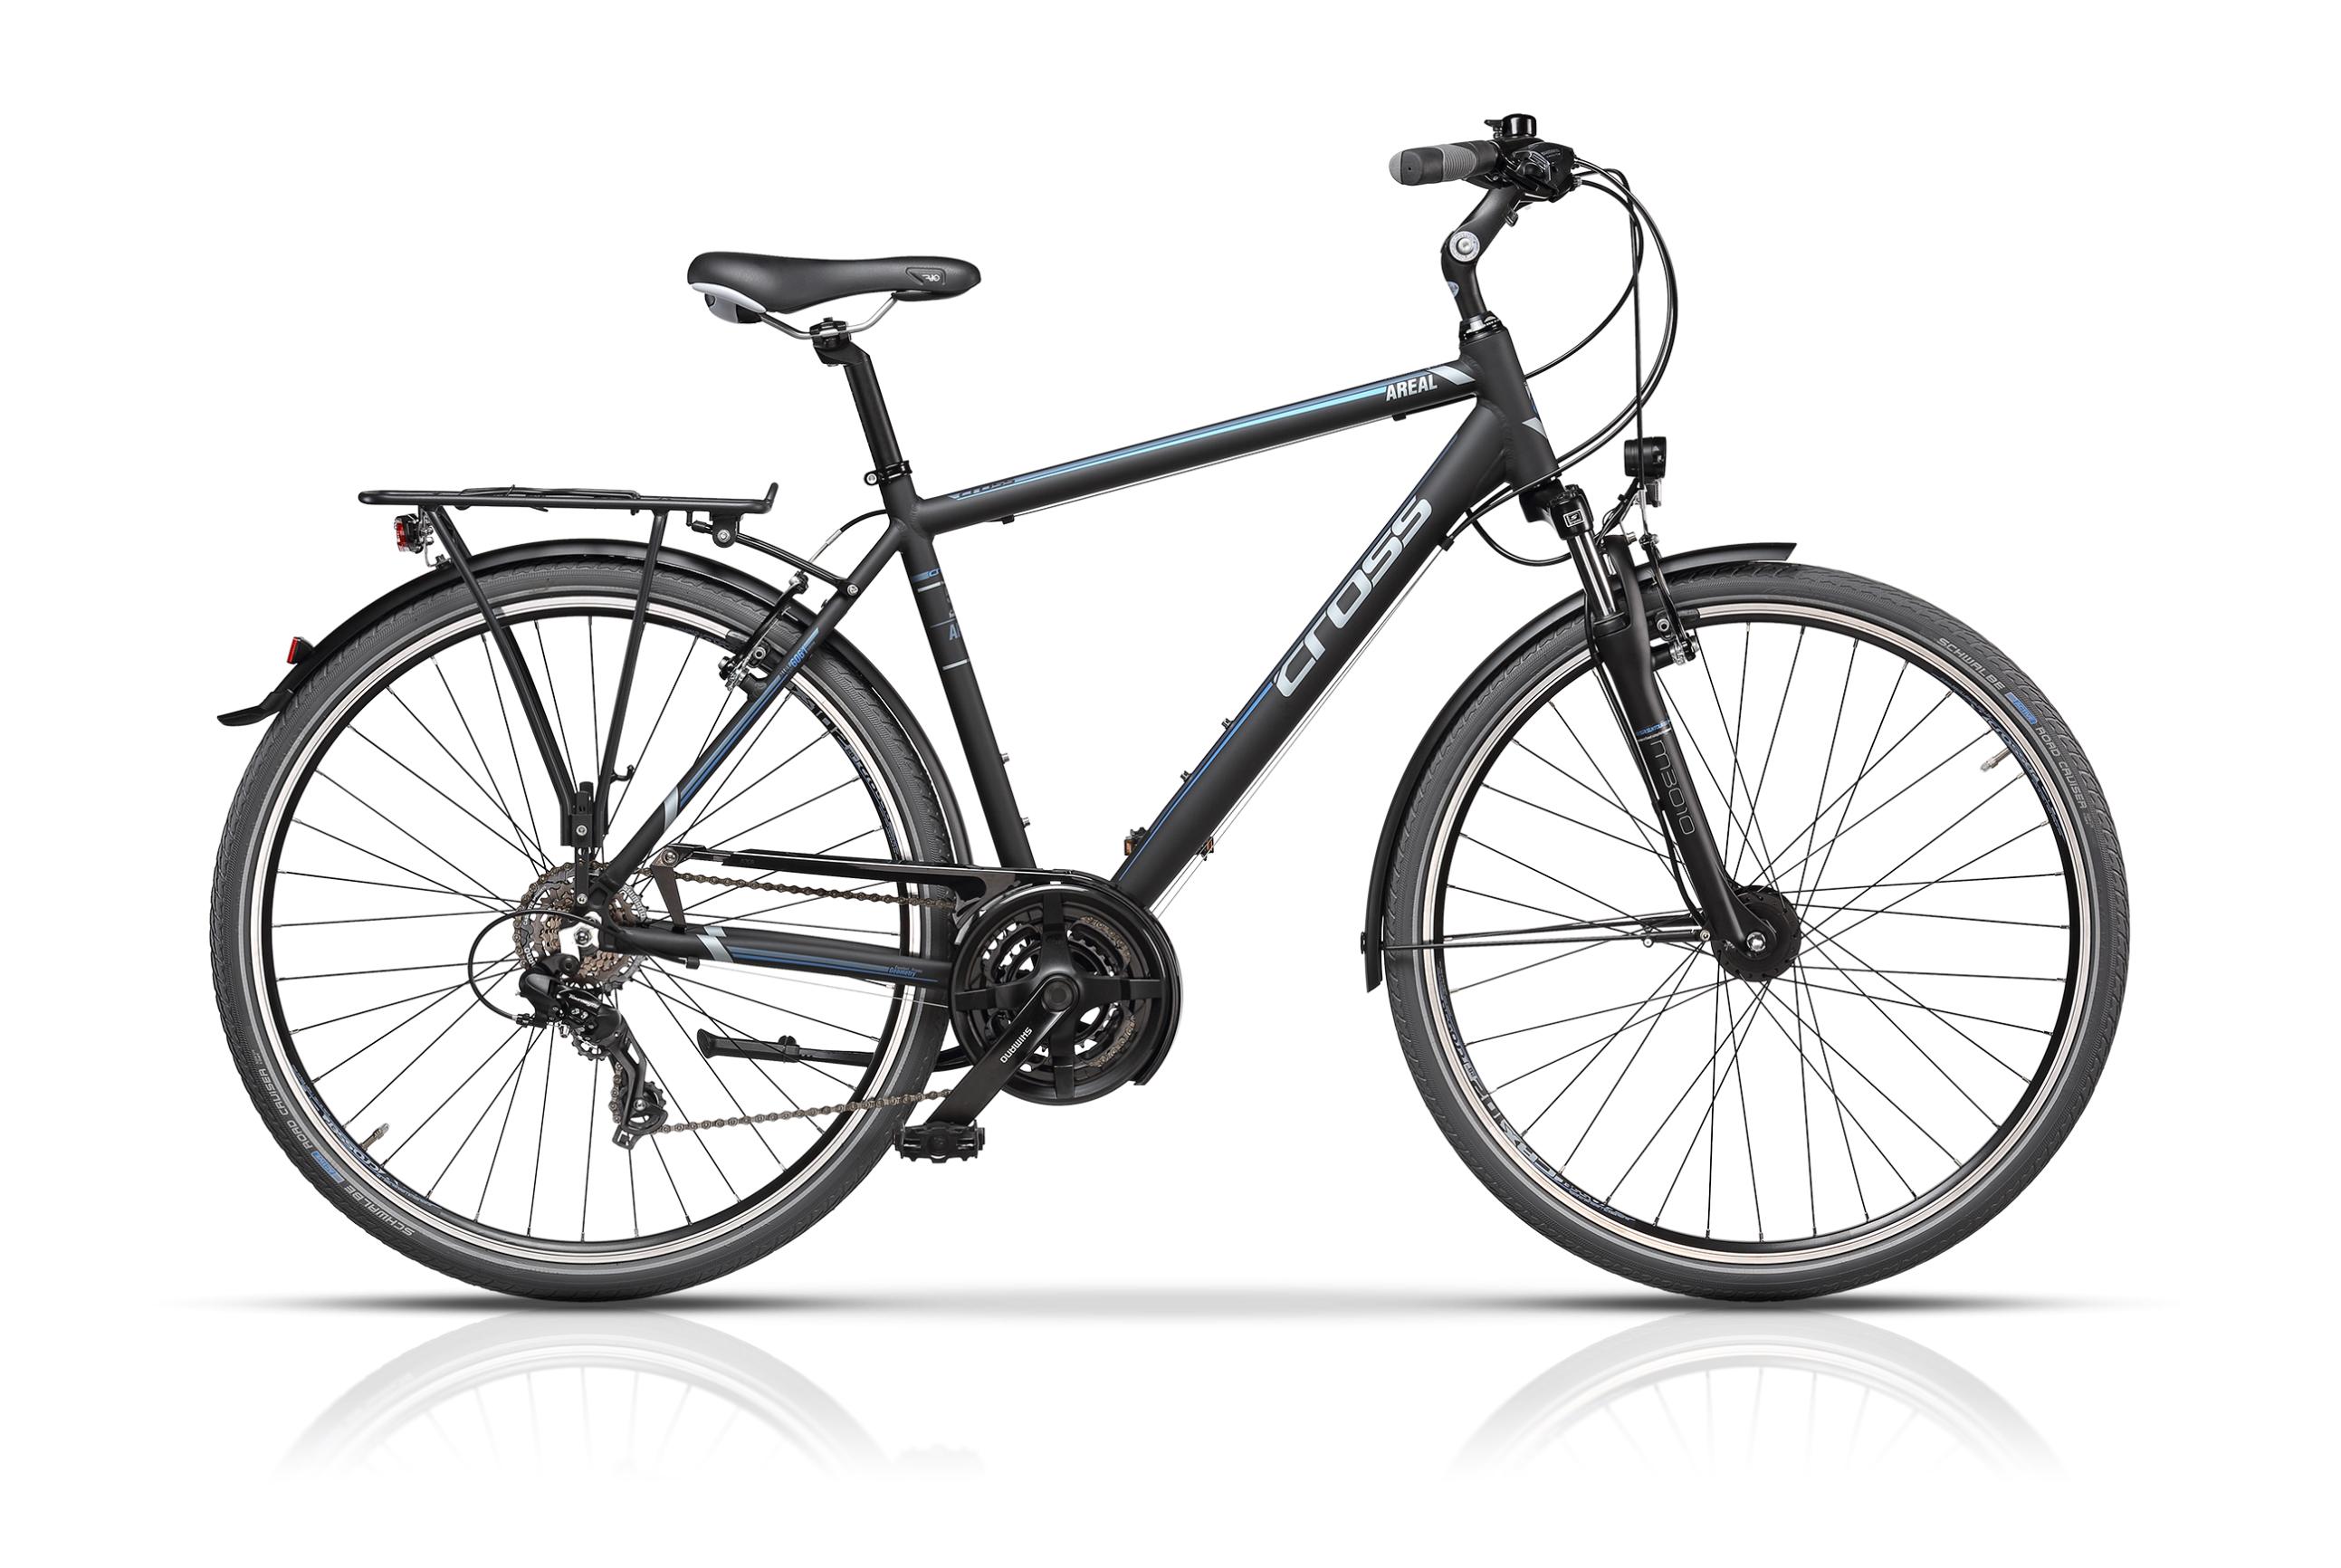 bicicleta cross areal man trekking 28 2017 freeridebikes. Black Bedroom Furniture Sets. Home Design Ideas